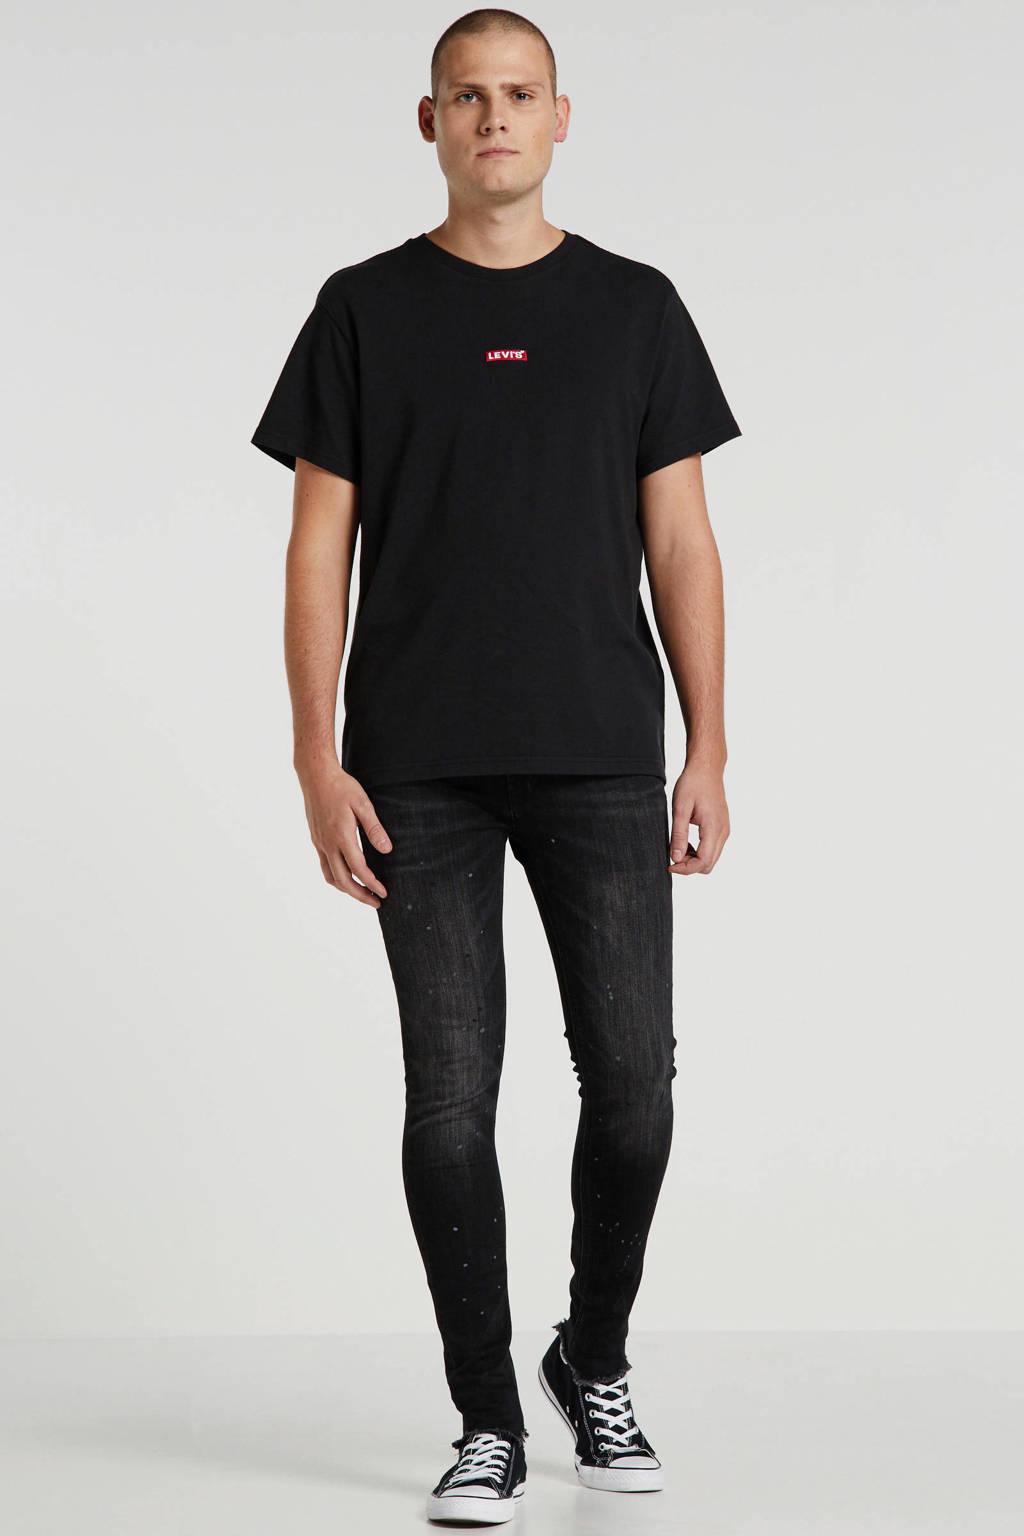 Levi's T-shirt met logo en borduursels zwart, Zwart